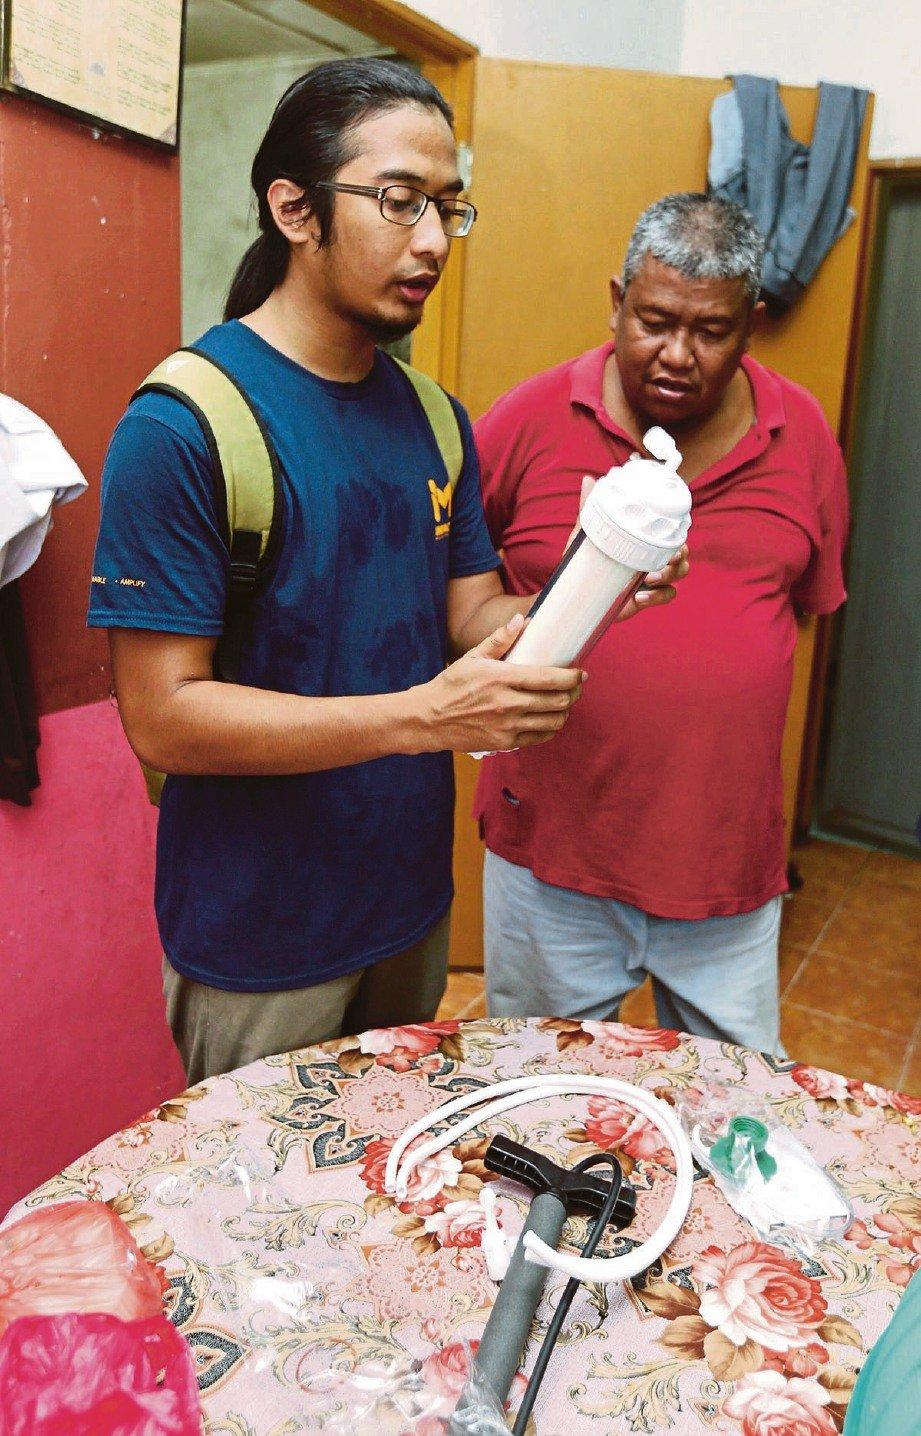 NAQIUDIN membantu memasang penapis air di rumah keluarga Latif. FOTO Zunnur Al Shafiq